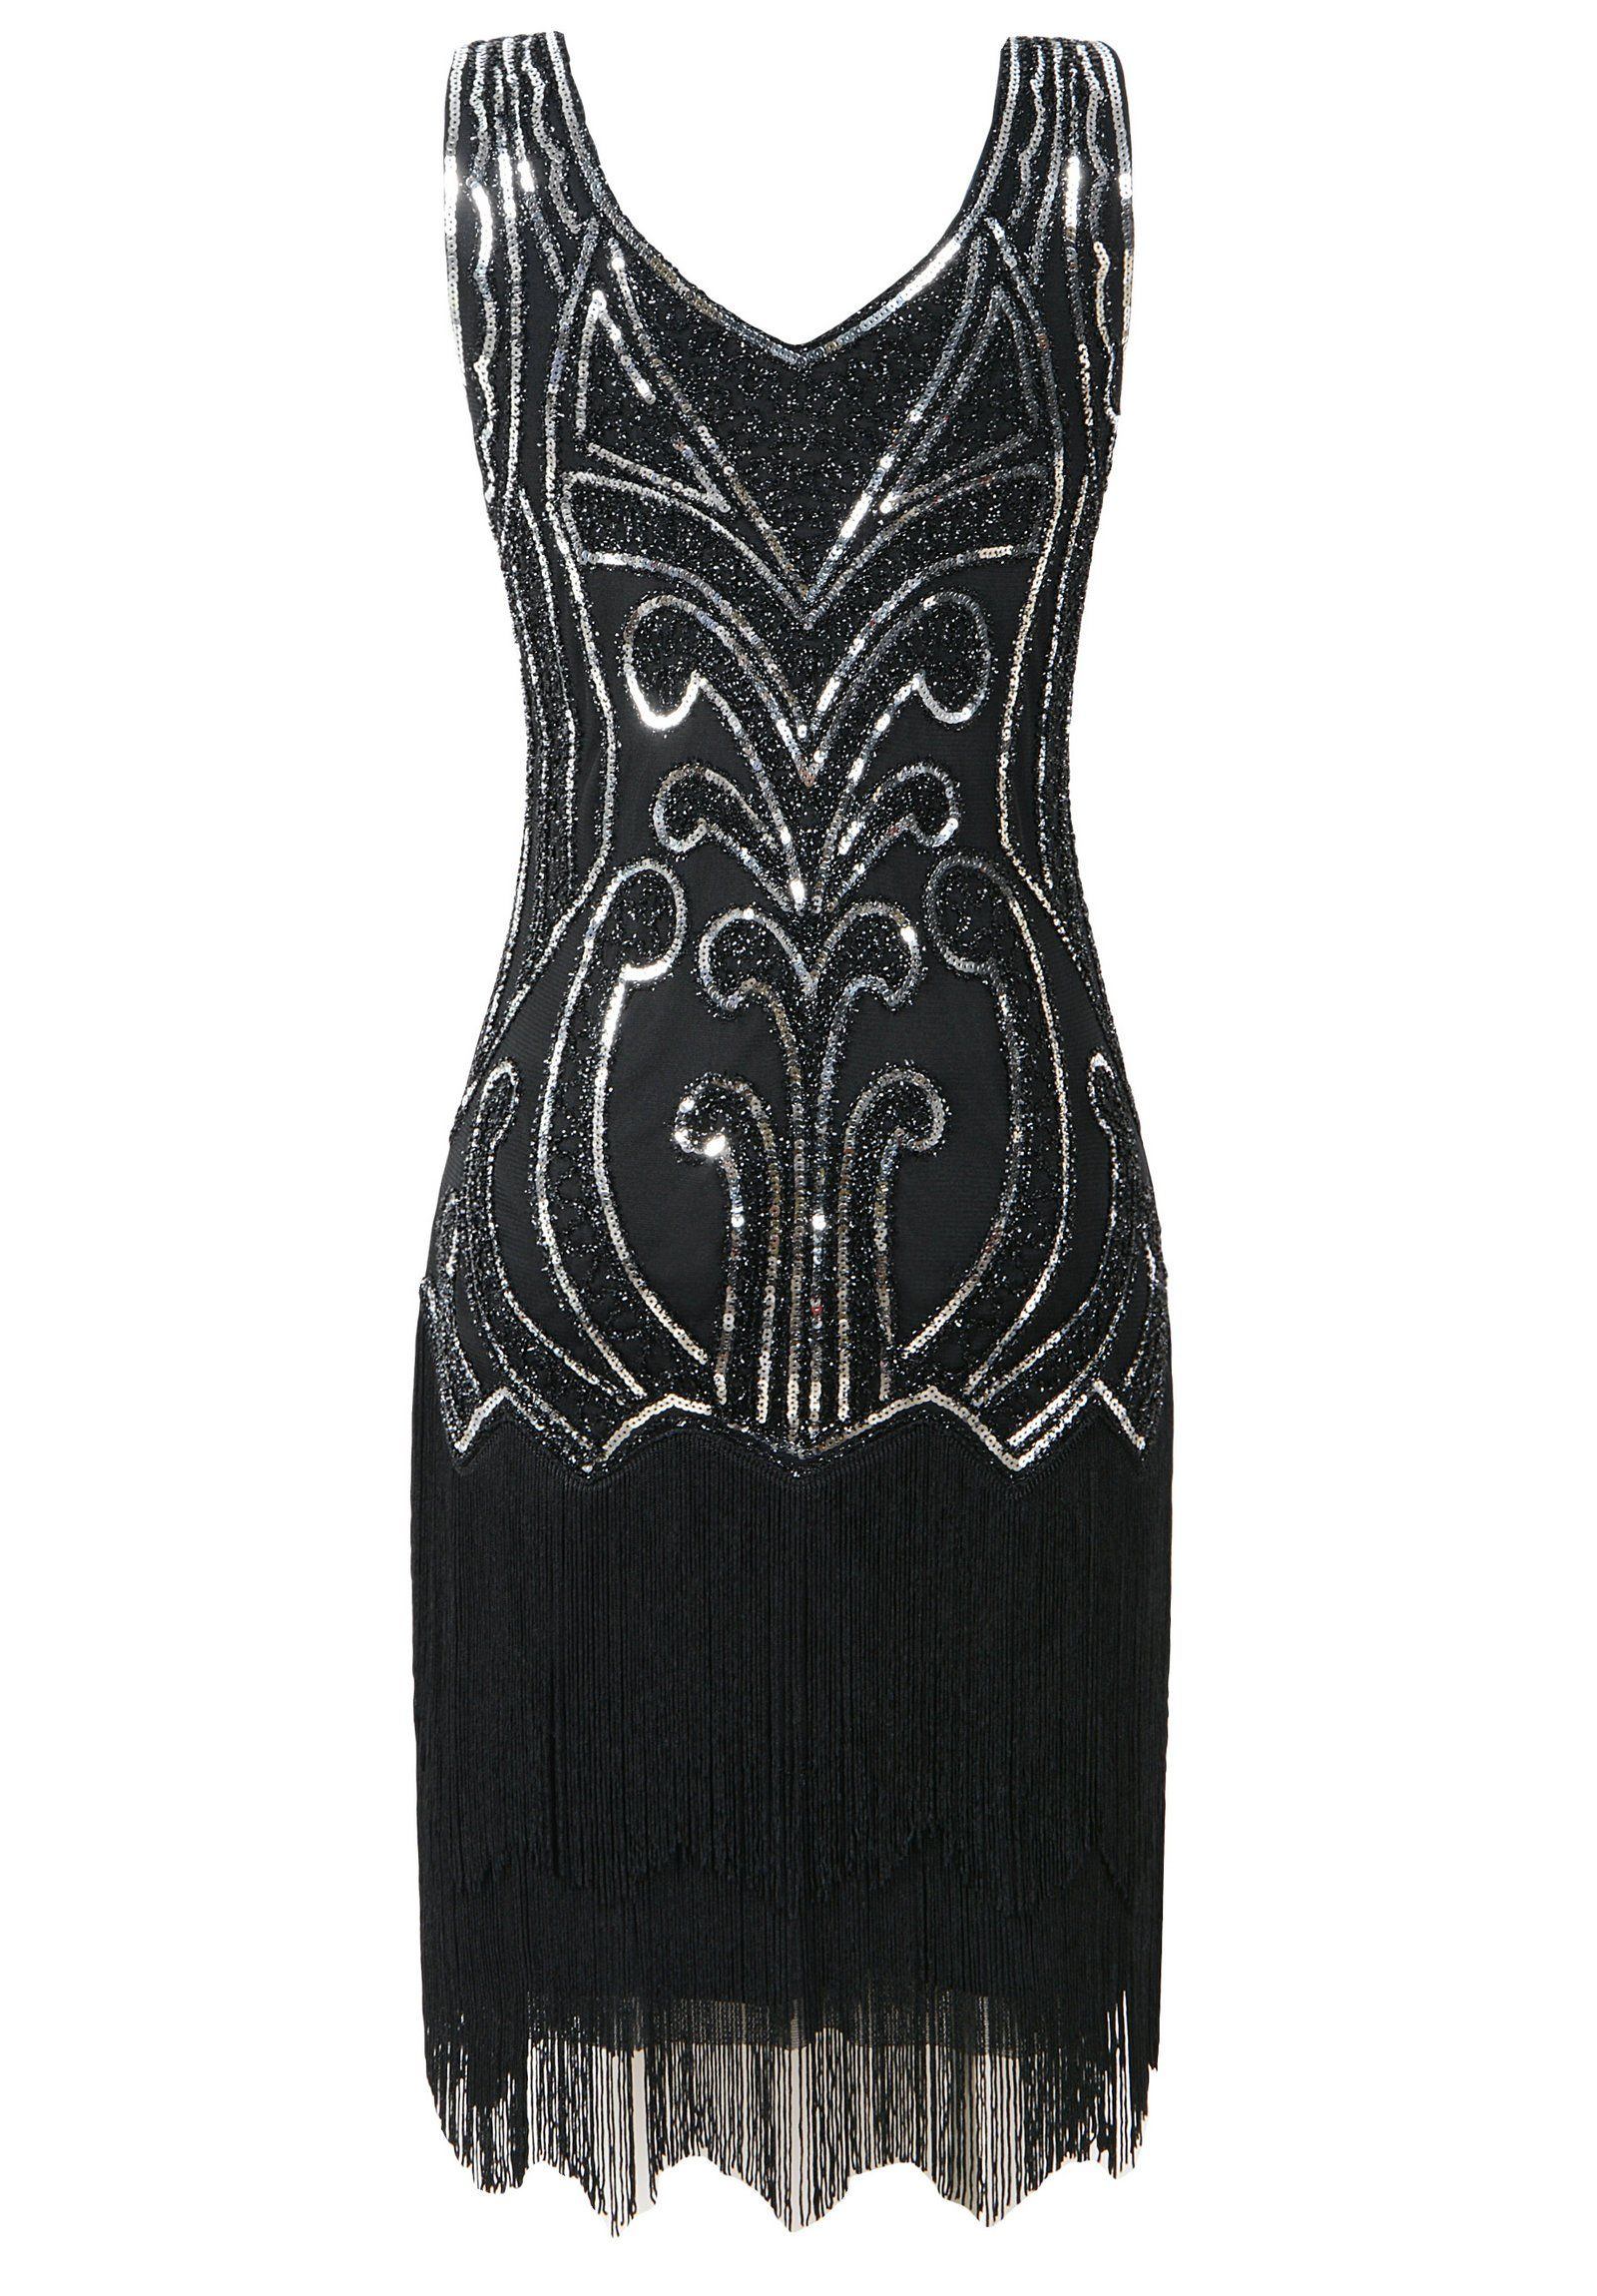 91e9e4929ee Mesisan Womens 1920s Flapper Dresses V Neck Vintage Gatsby Bead Sequin  Fringed Great Gatsby DressBlack XL   Click image for more details.